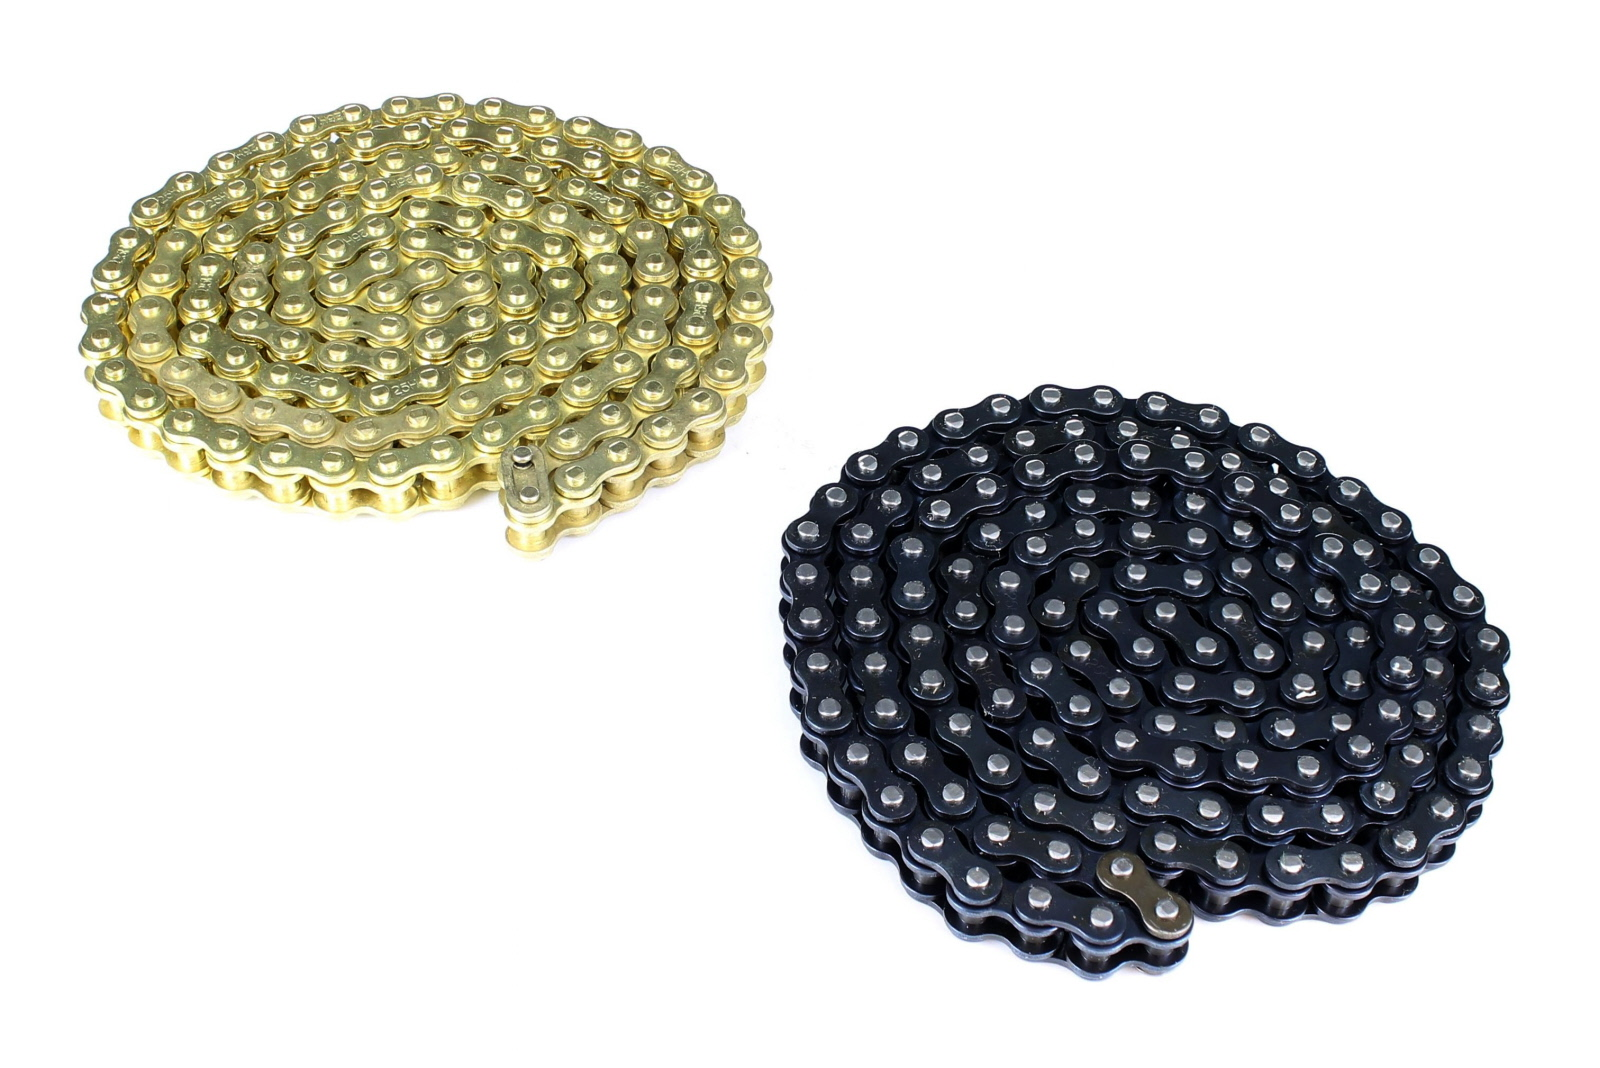 Drive Chain Mini Moto 6mm 25H 79 Links // 158 Pins, Gold